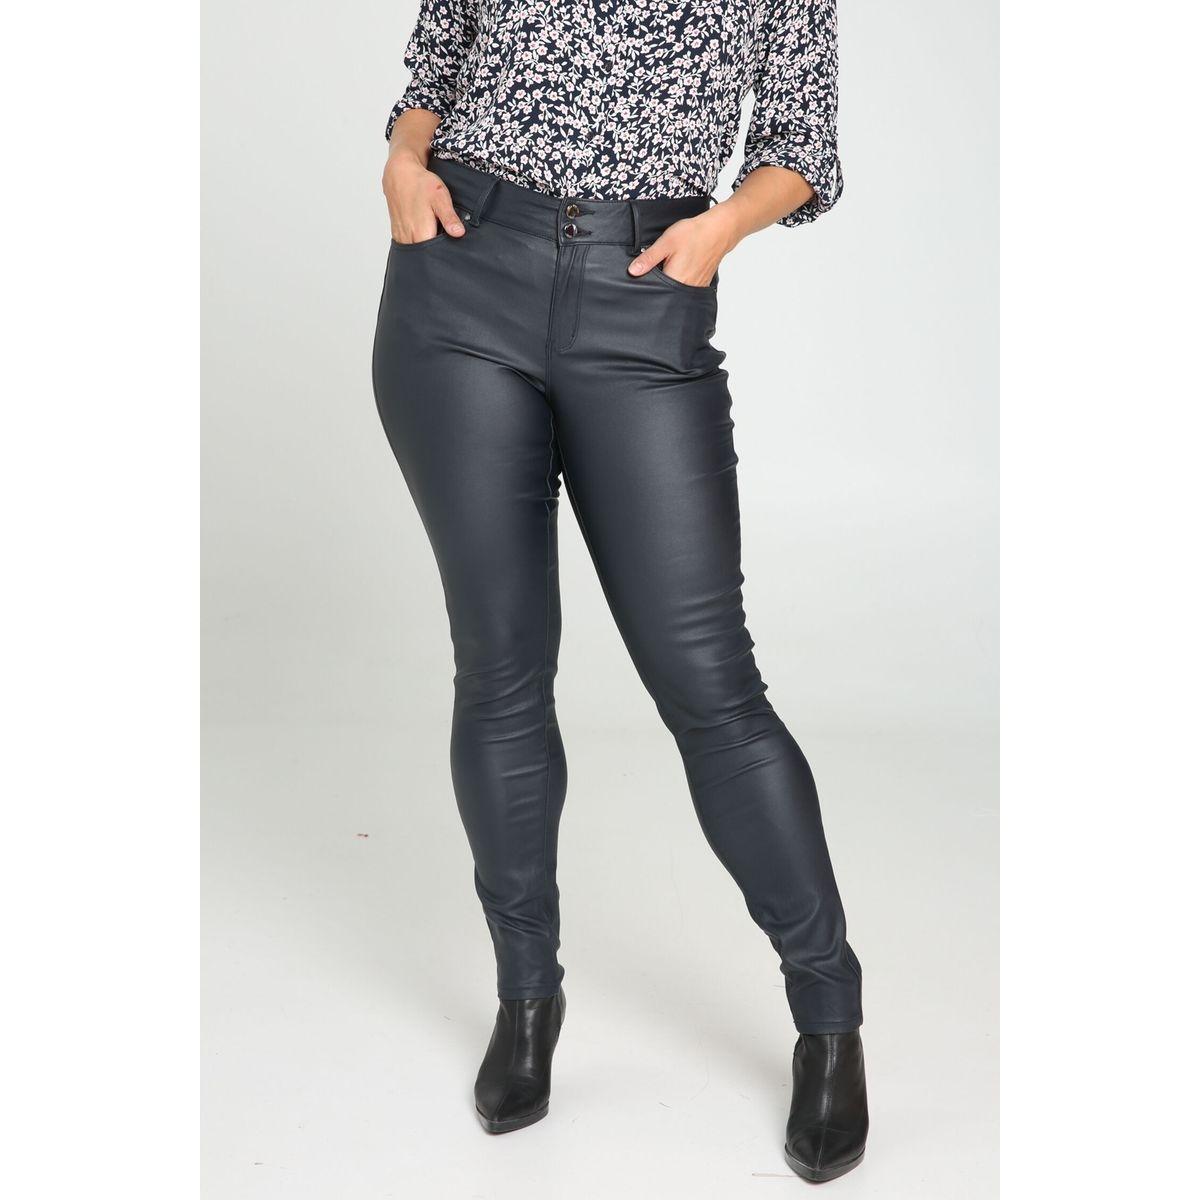 Pantalon Slim enduit extra long - Longueur 34